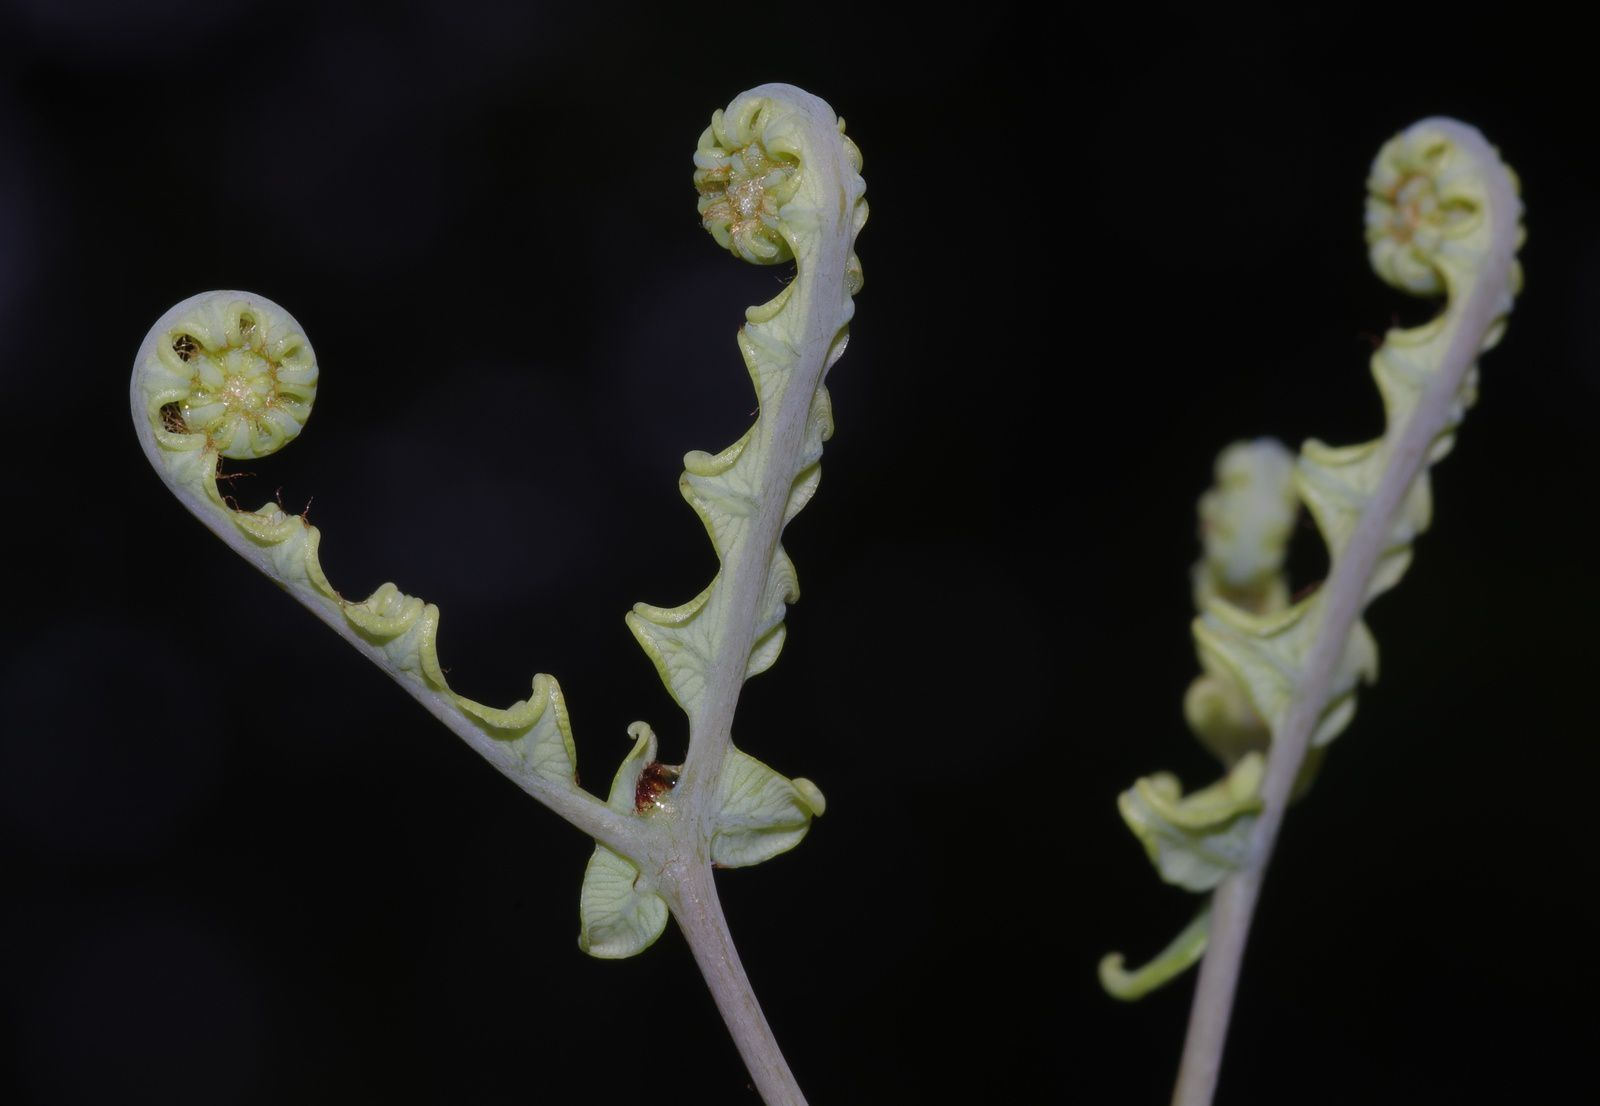 Dicranopteris flexuosa